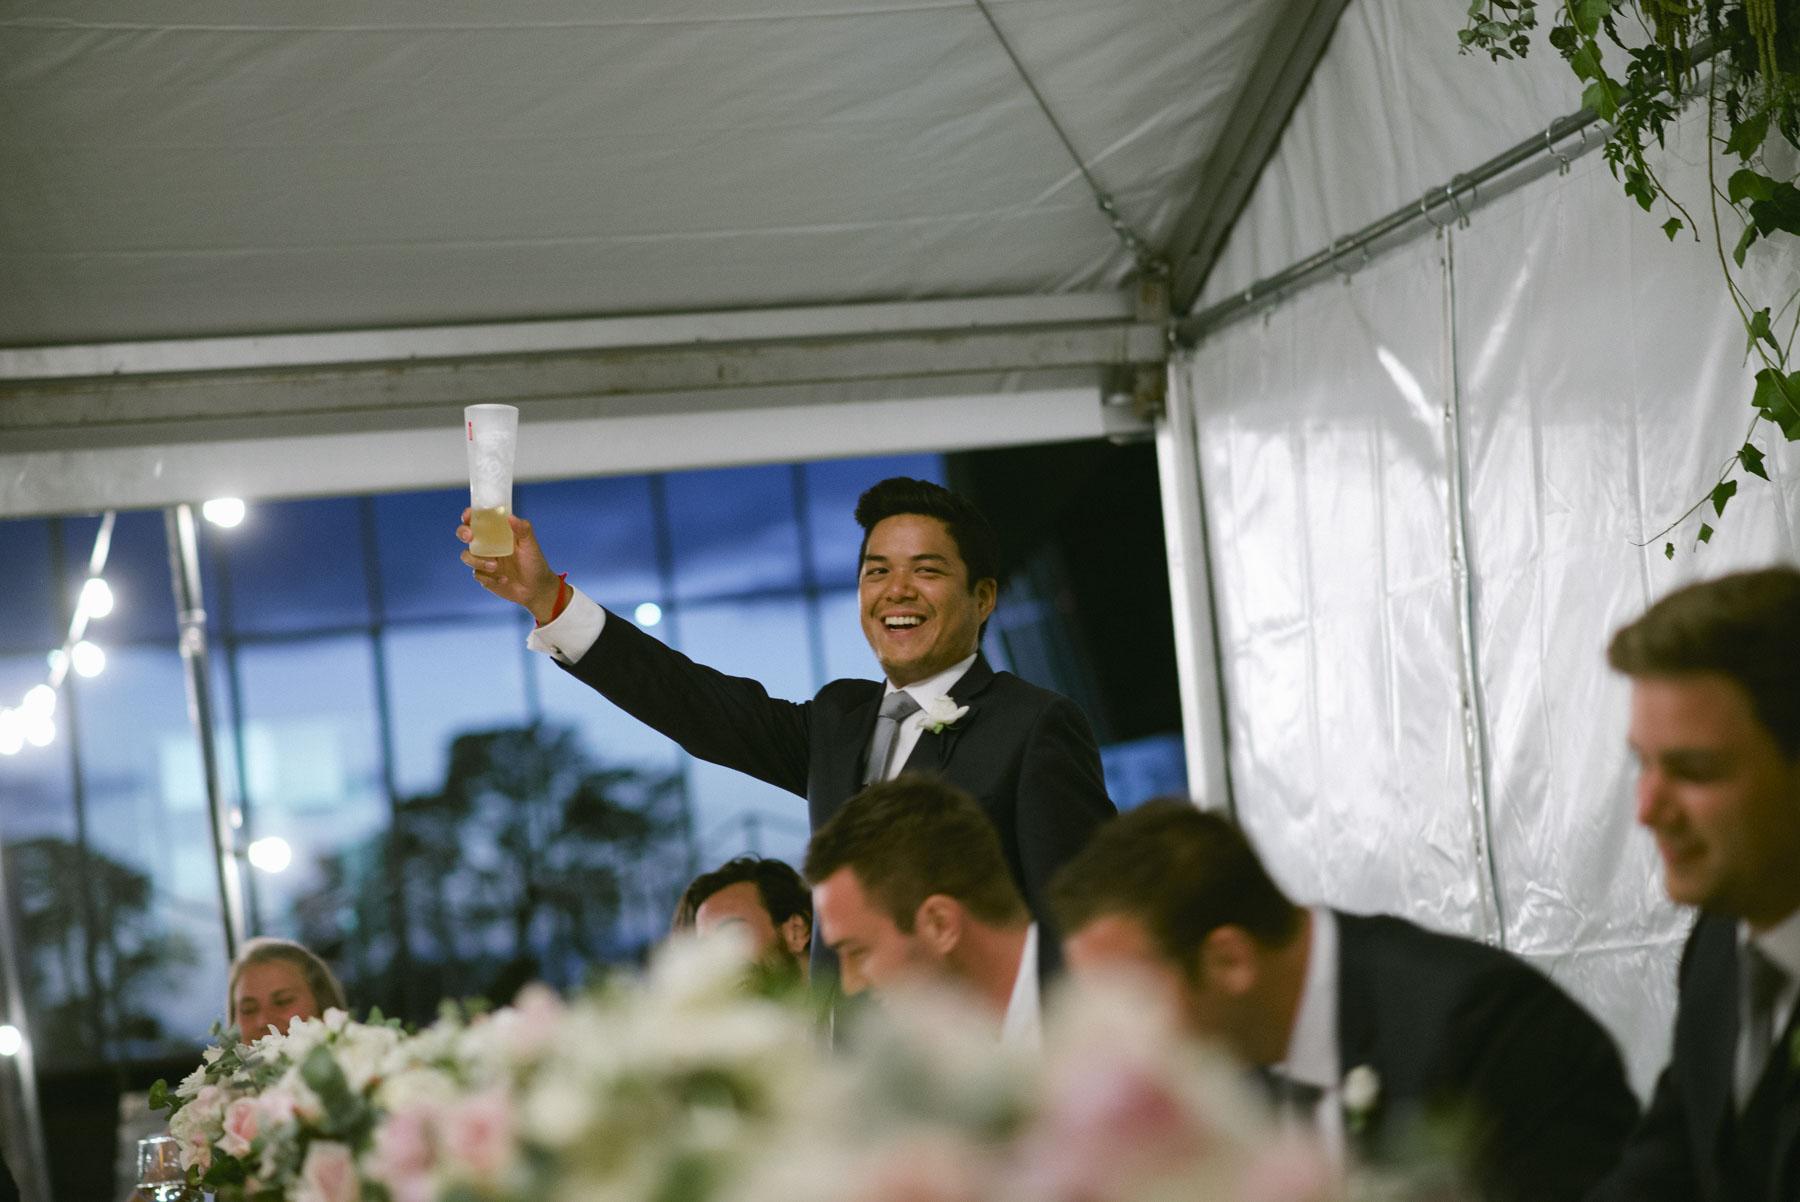 1501vand-417alan_moyle_wedding_portrait_brighton_bayside_werribee_estate_mansion_zoo_rustic_styled_garden_mansion_candid_documentry_victoria_whitelaw.jpg